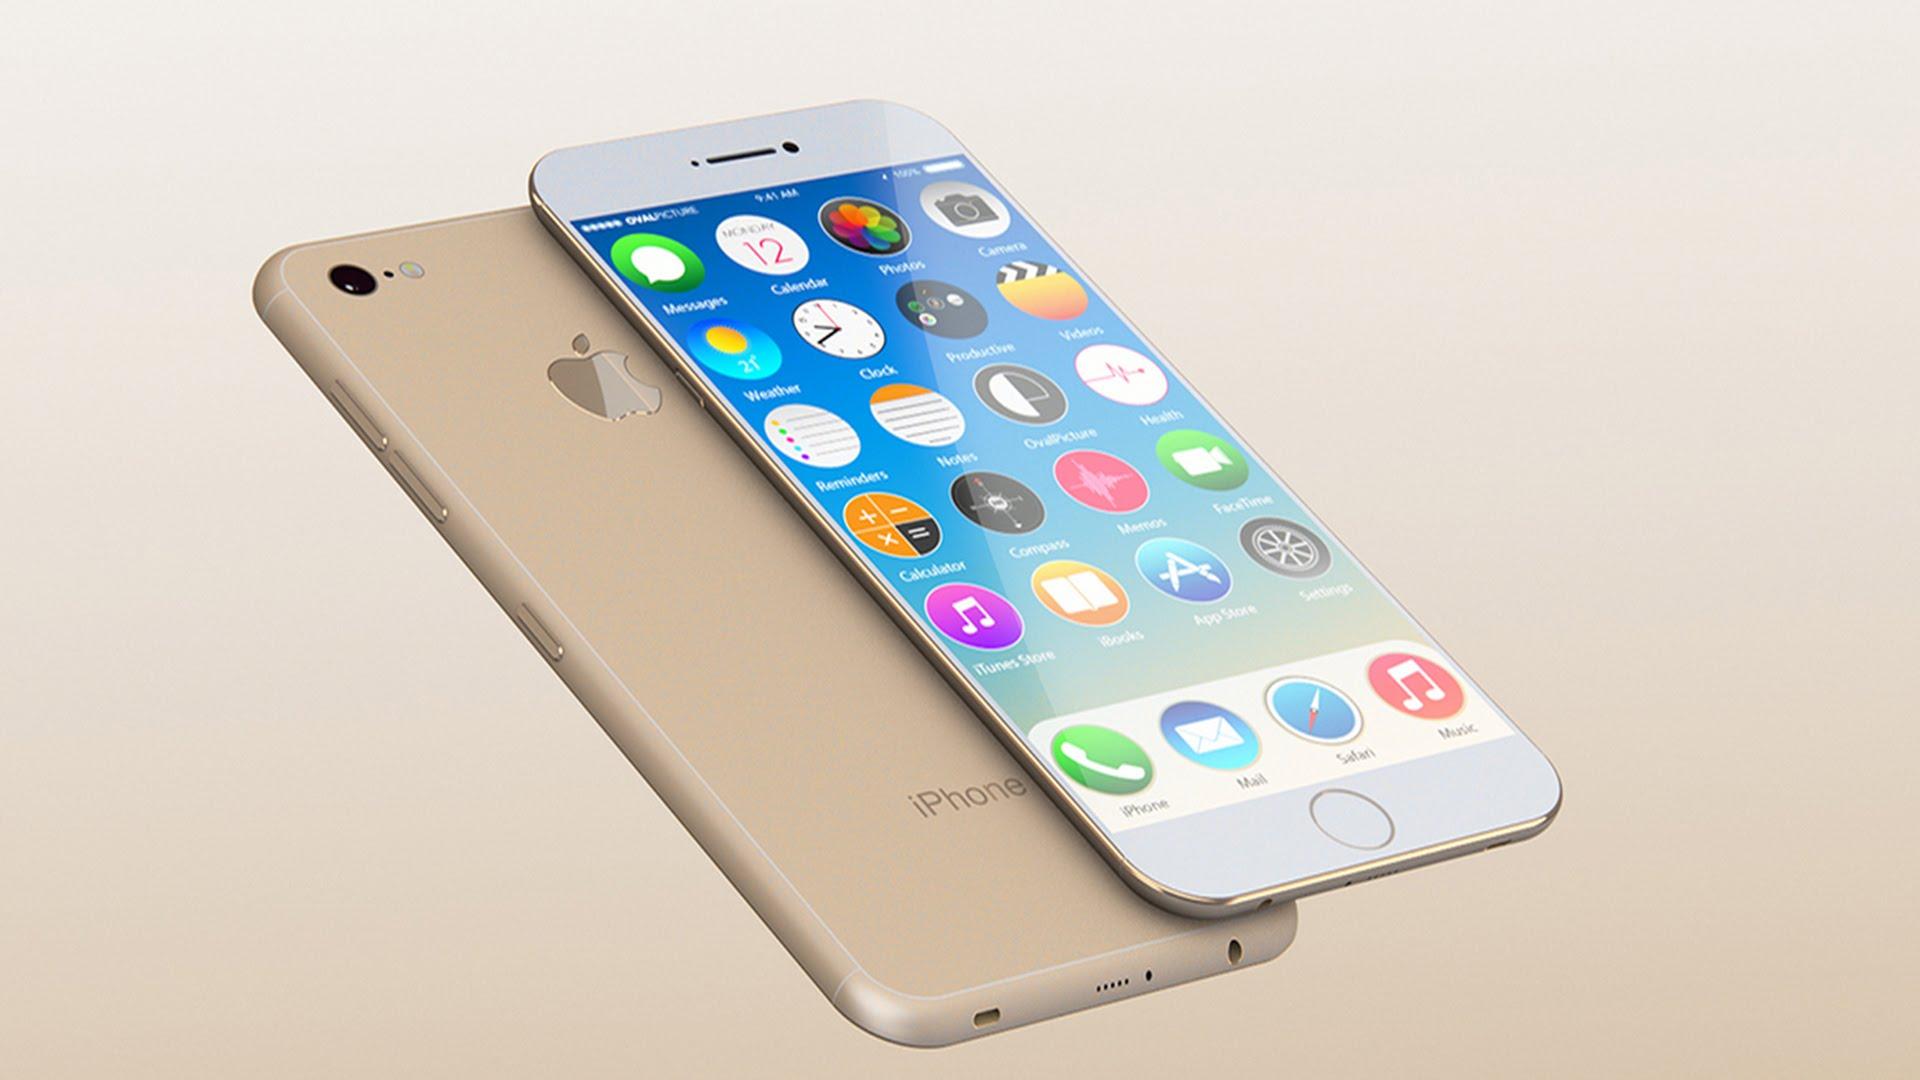 ������ ������ ��������� iPhone ����� ������� ���������� ������